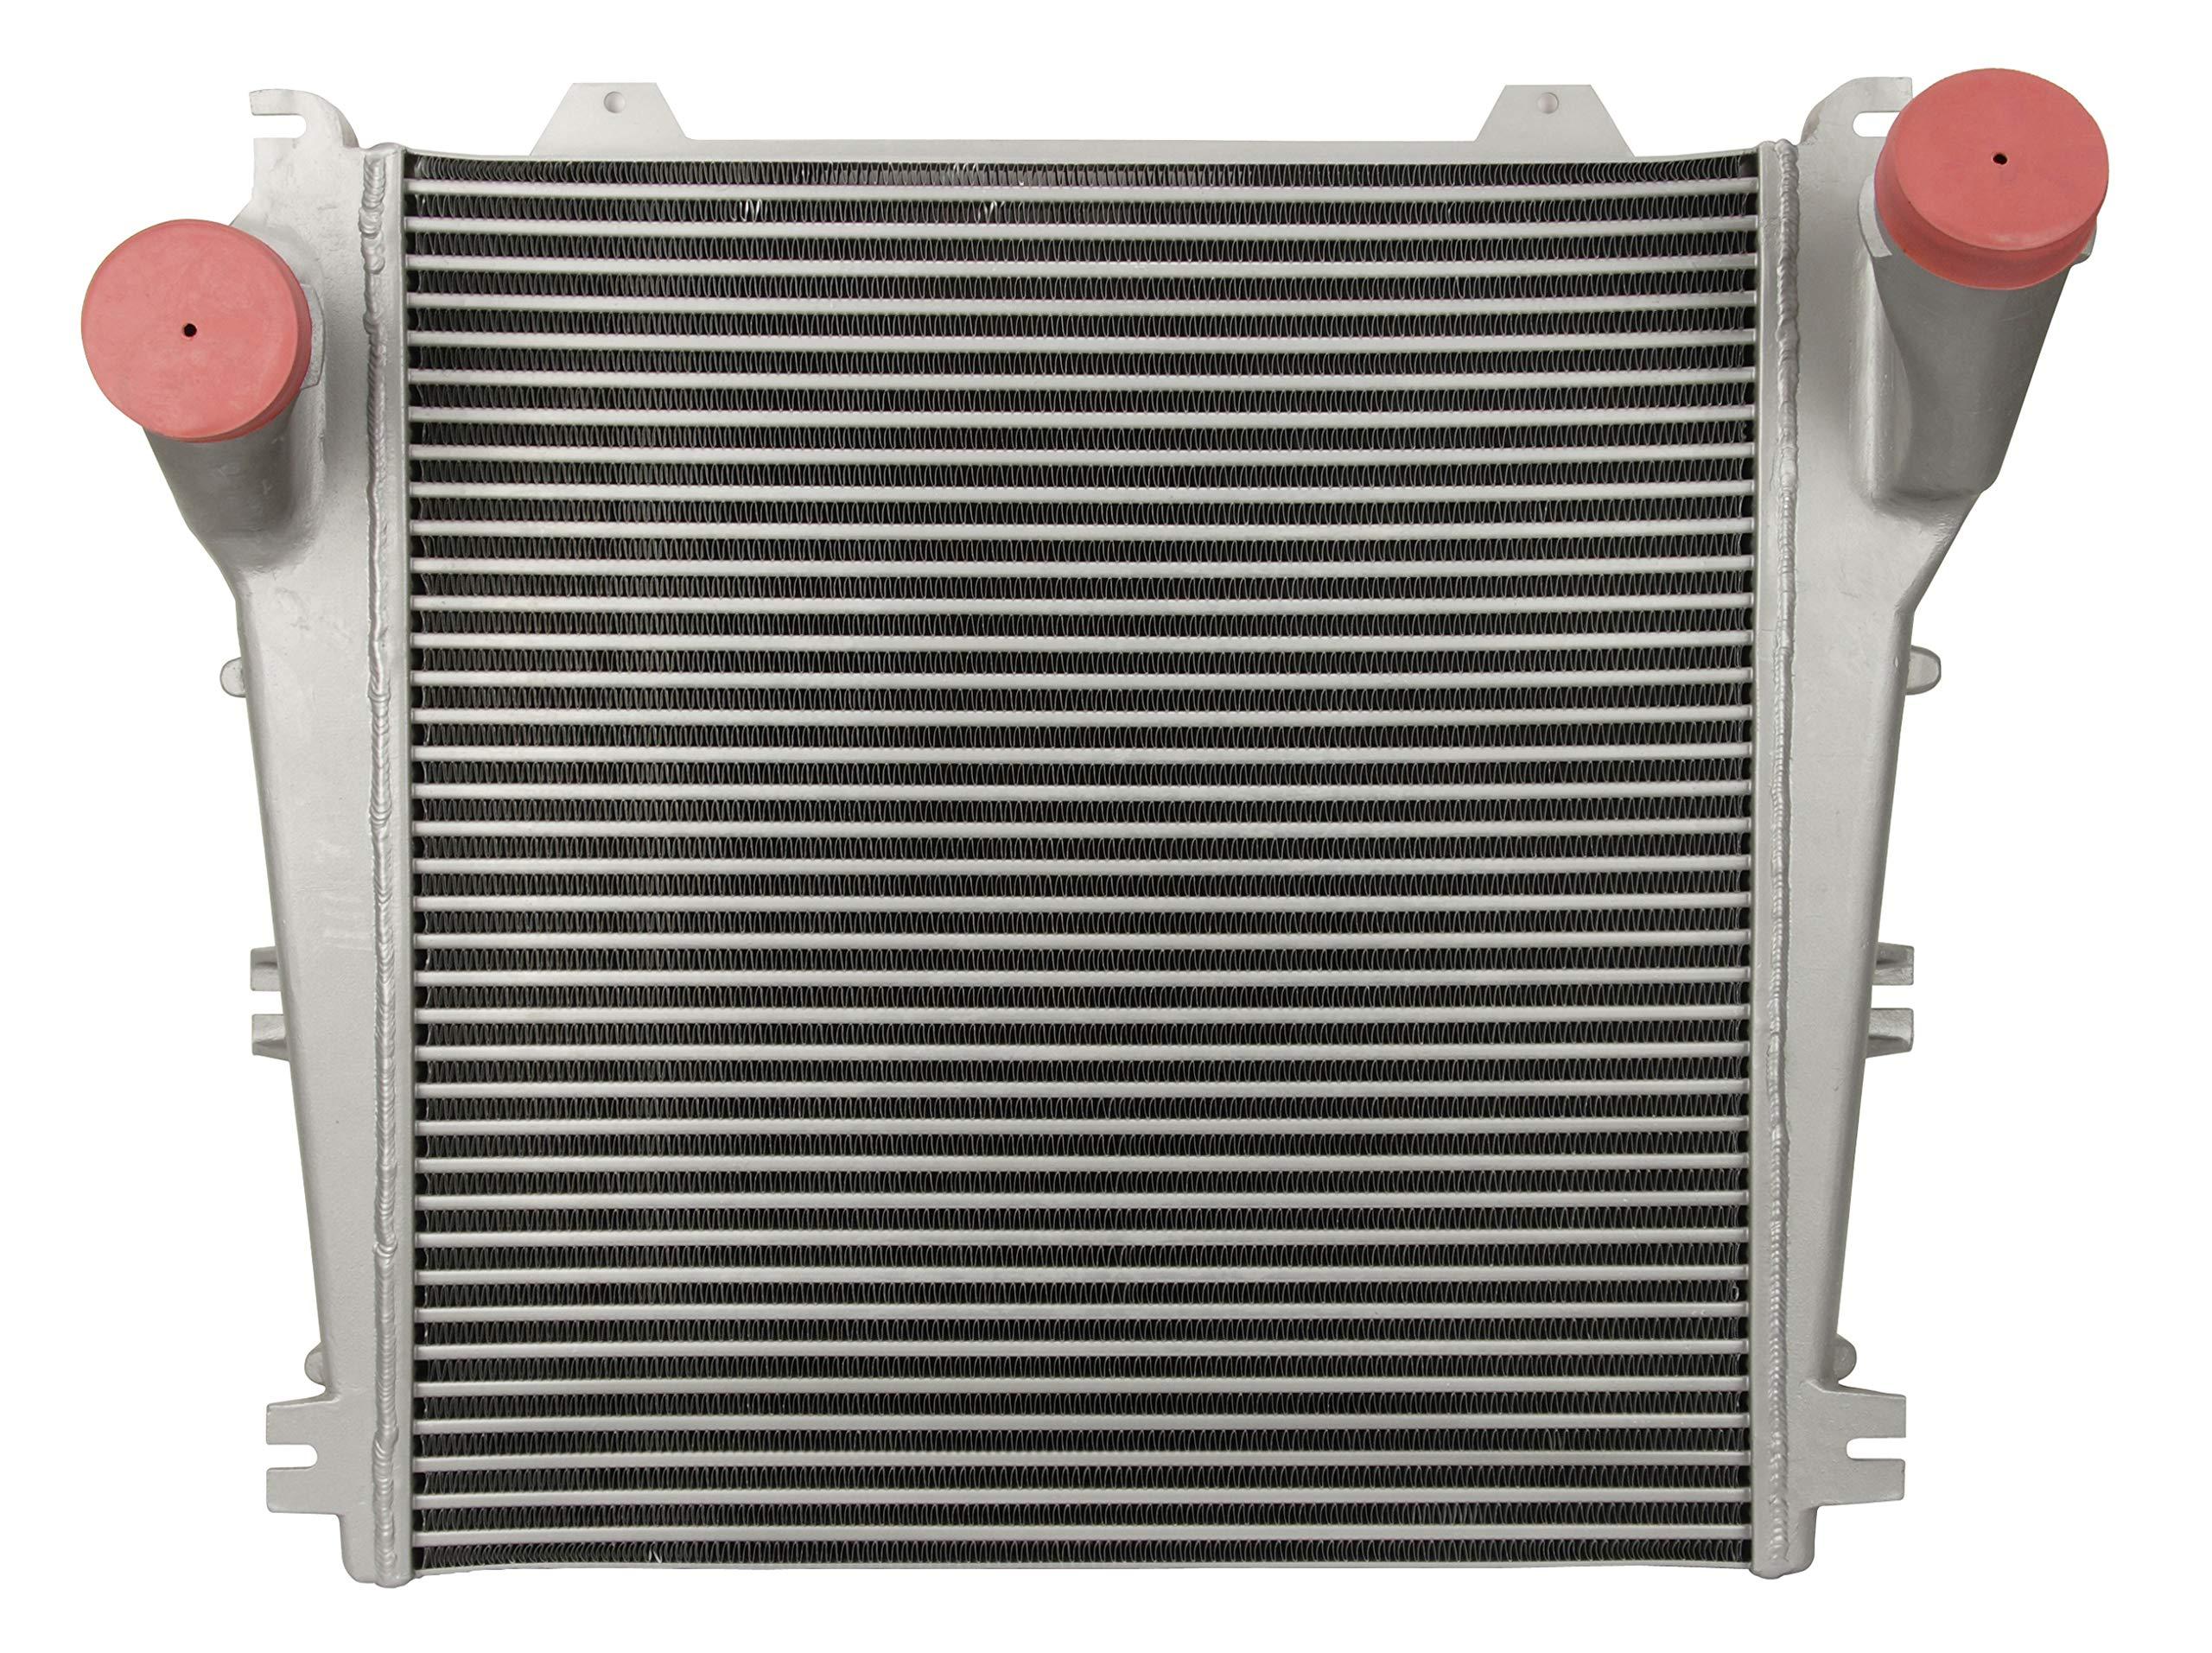 Spectra Premium 4401-1712 Turbocharger Intercooler by Spectra Premium